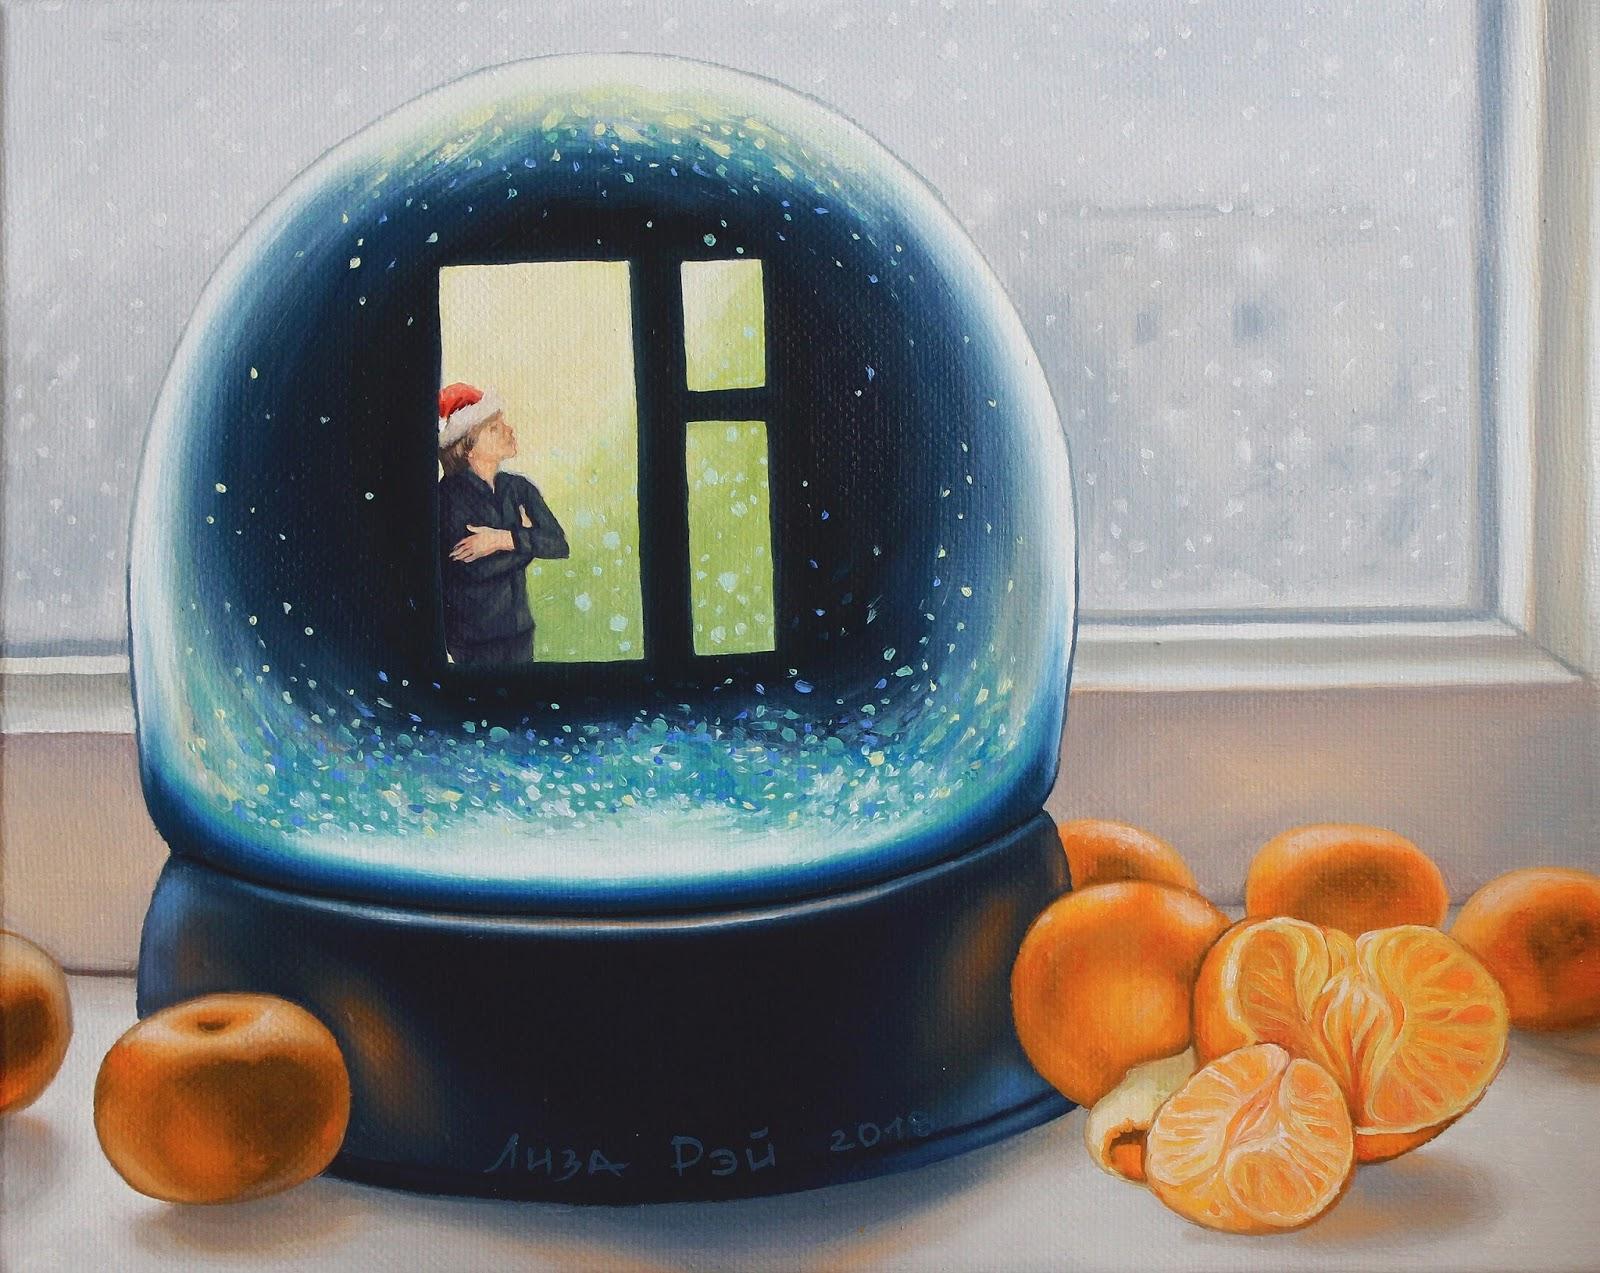 Сюрреализм. Лиза Рэй - Снег за окном